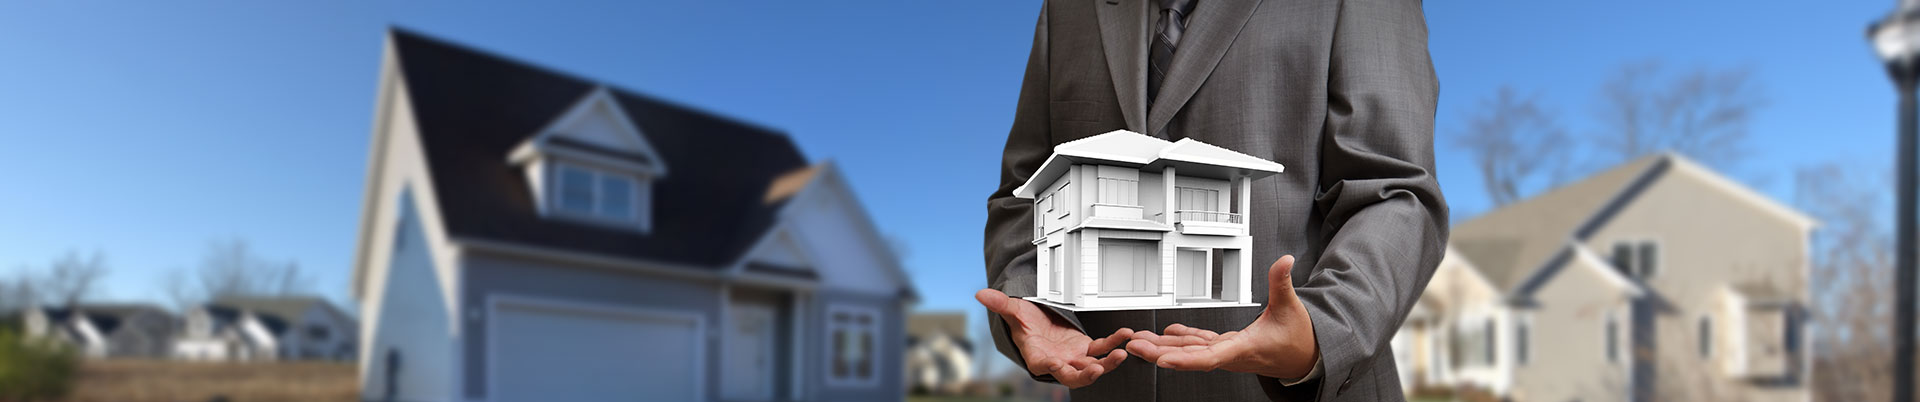 Property Management Software Development